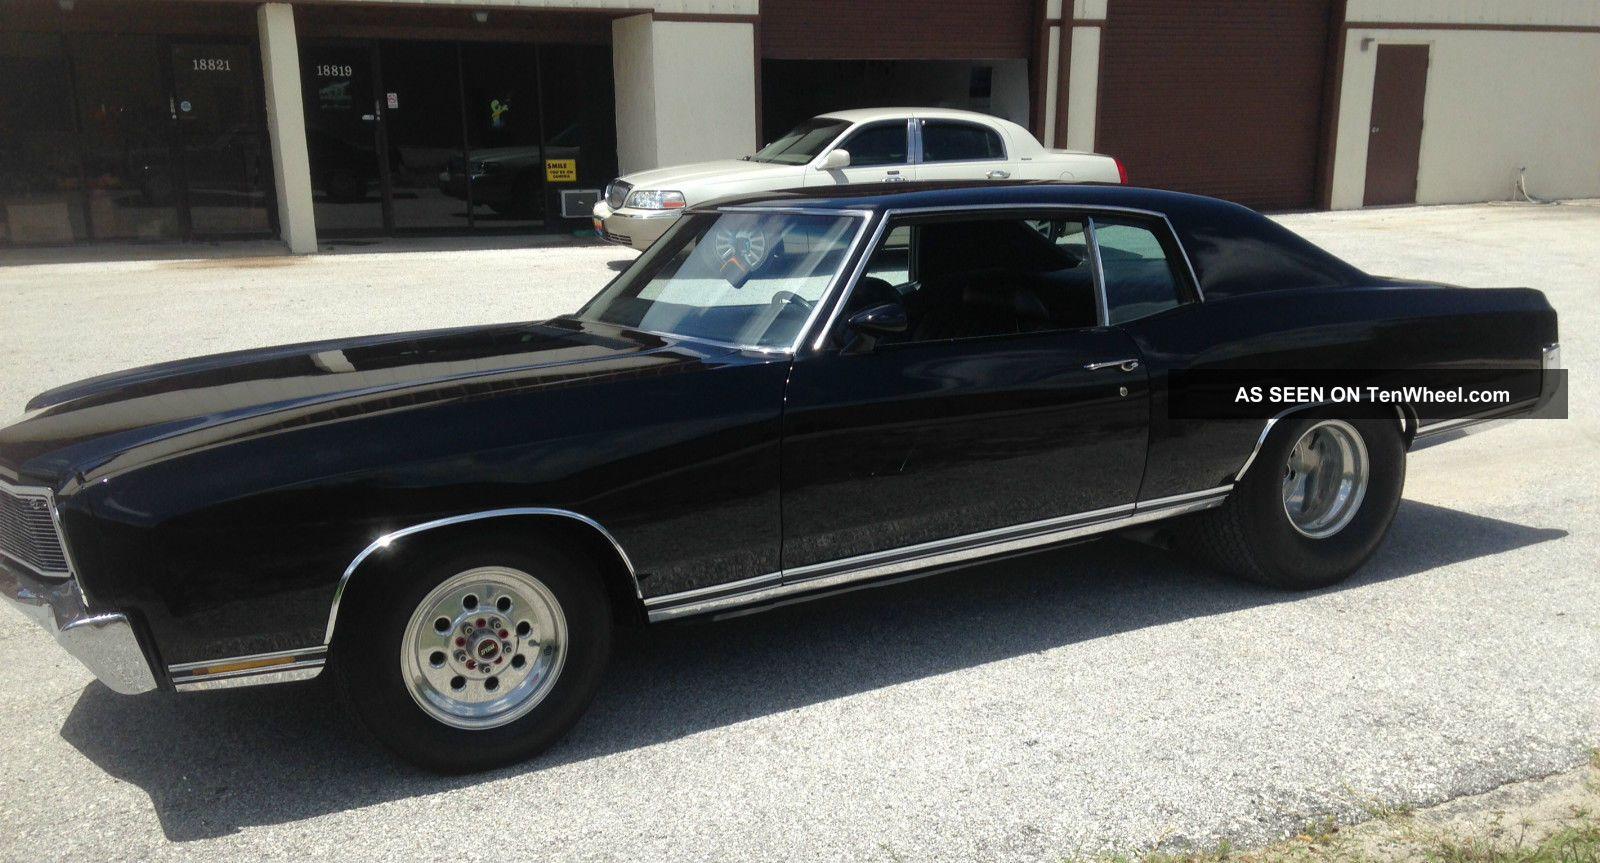 2015 Hellcat likewise Dodge Charger Generations in addition 1967 DODGE DART CUSTOM 2 DOOR HARDTOP 43651 additionally 1959 Mark 2 likewise Sale. on dodge 340 v8 engine